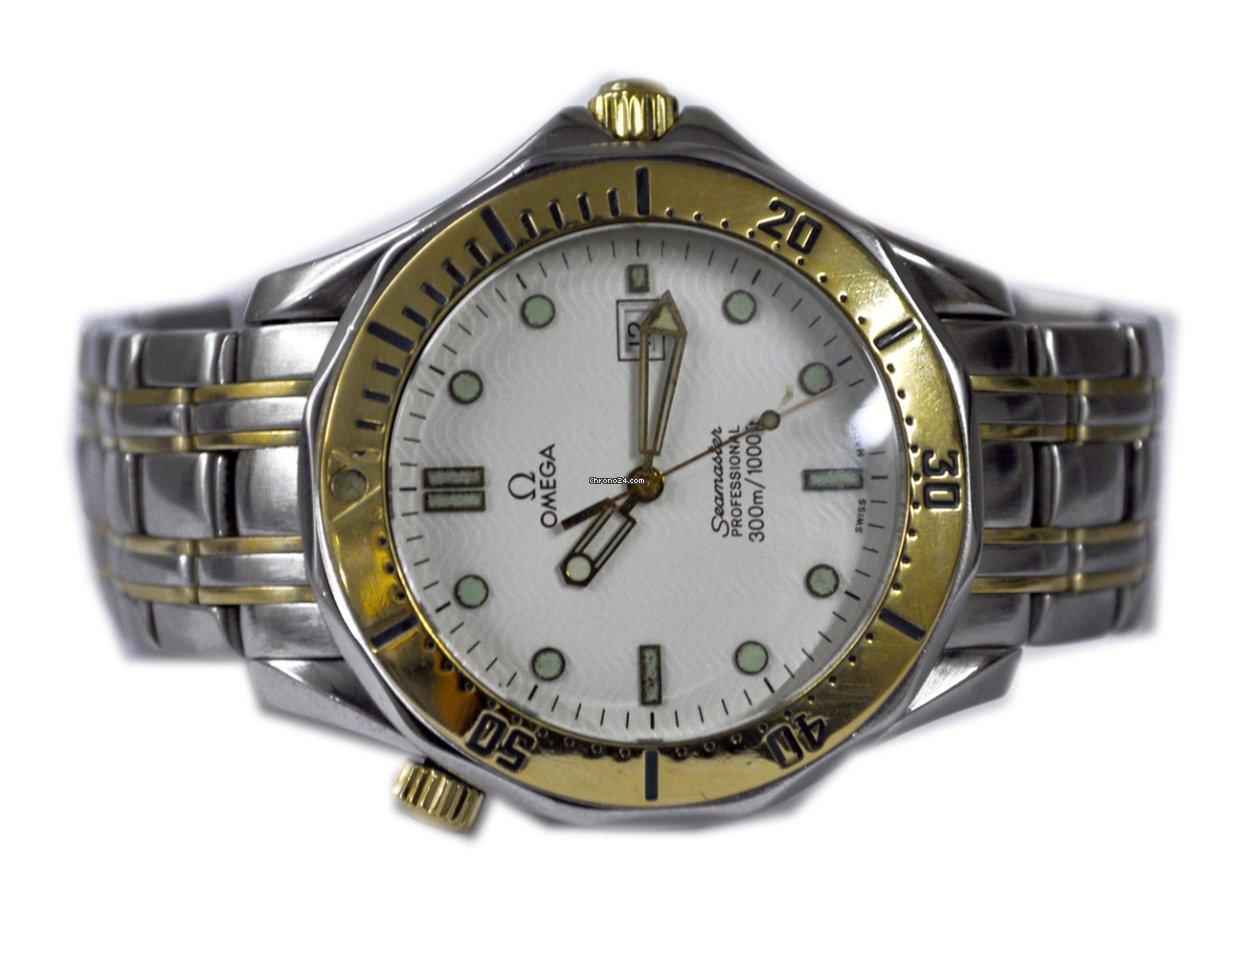 d3d50c7e0bb Comprar relógios Omega